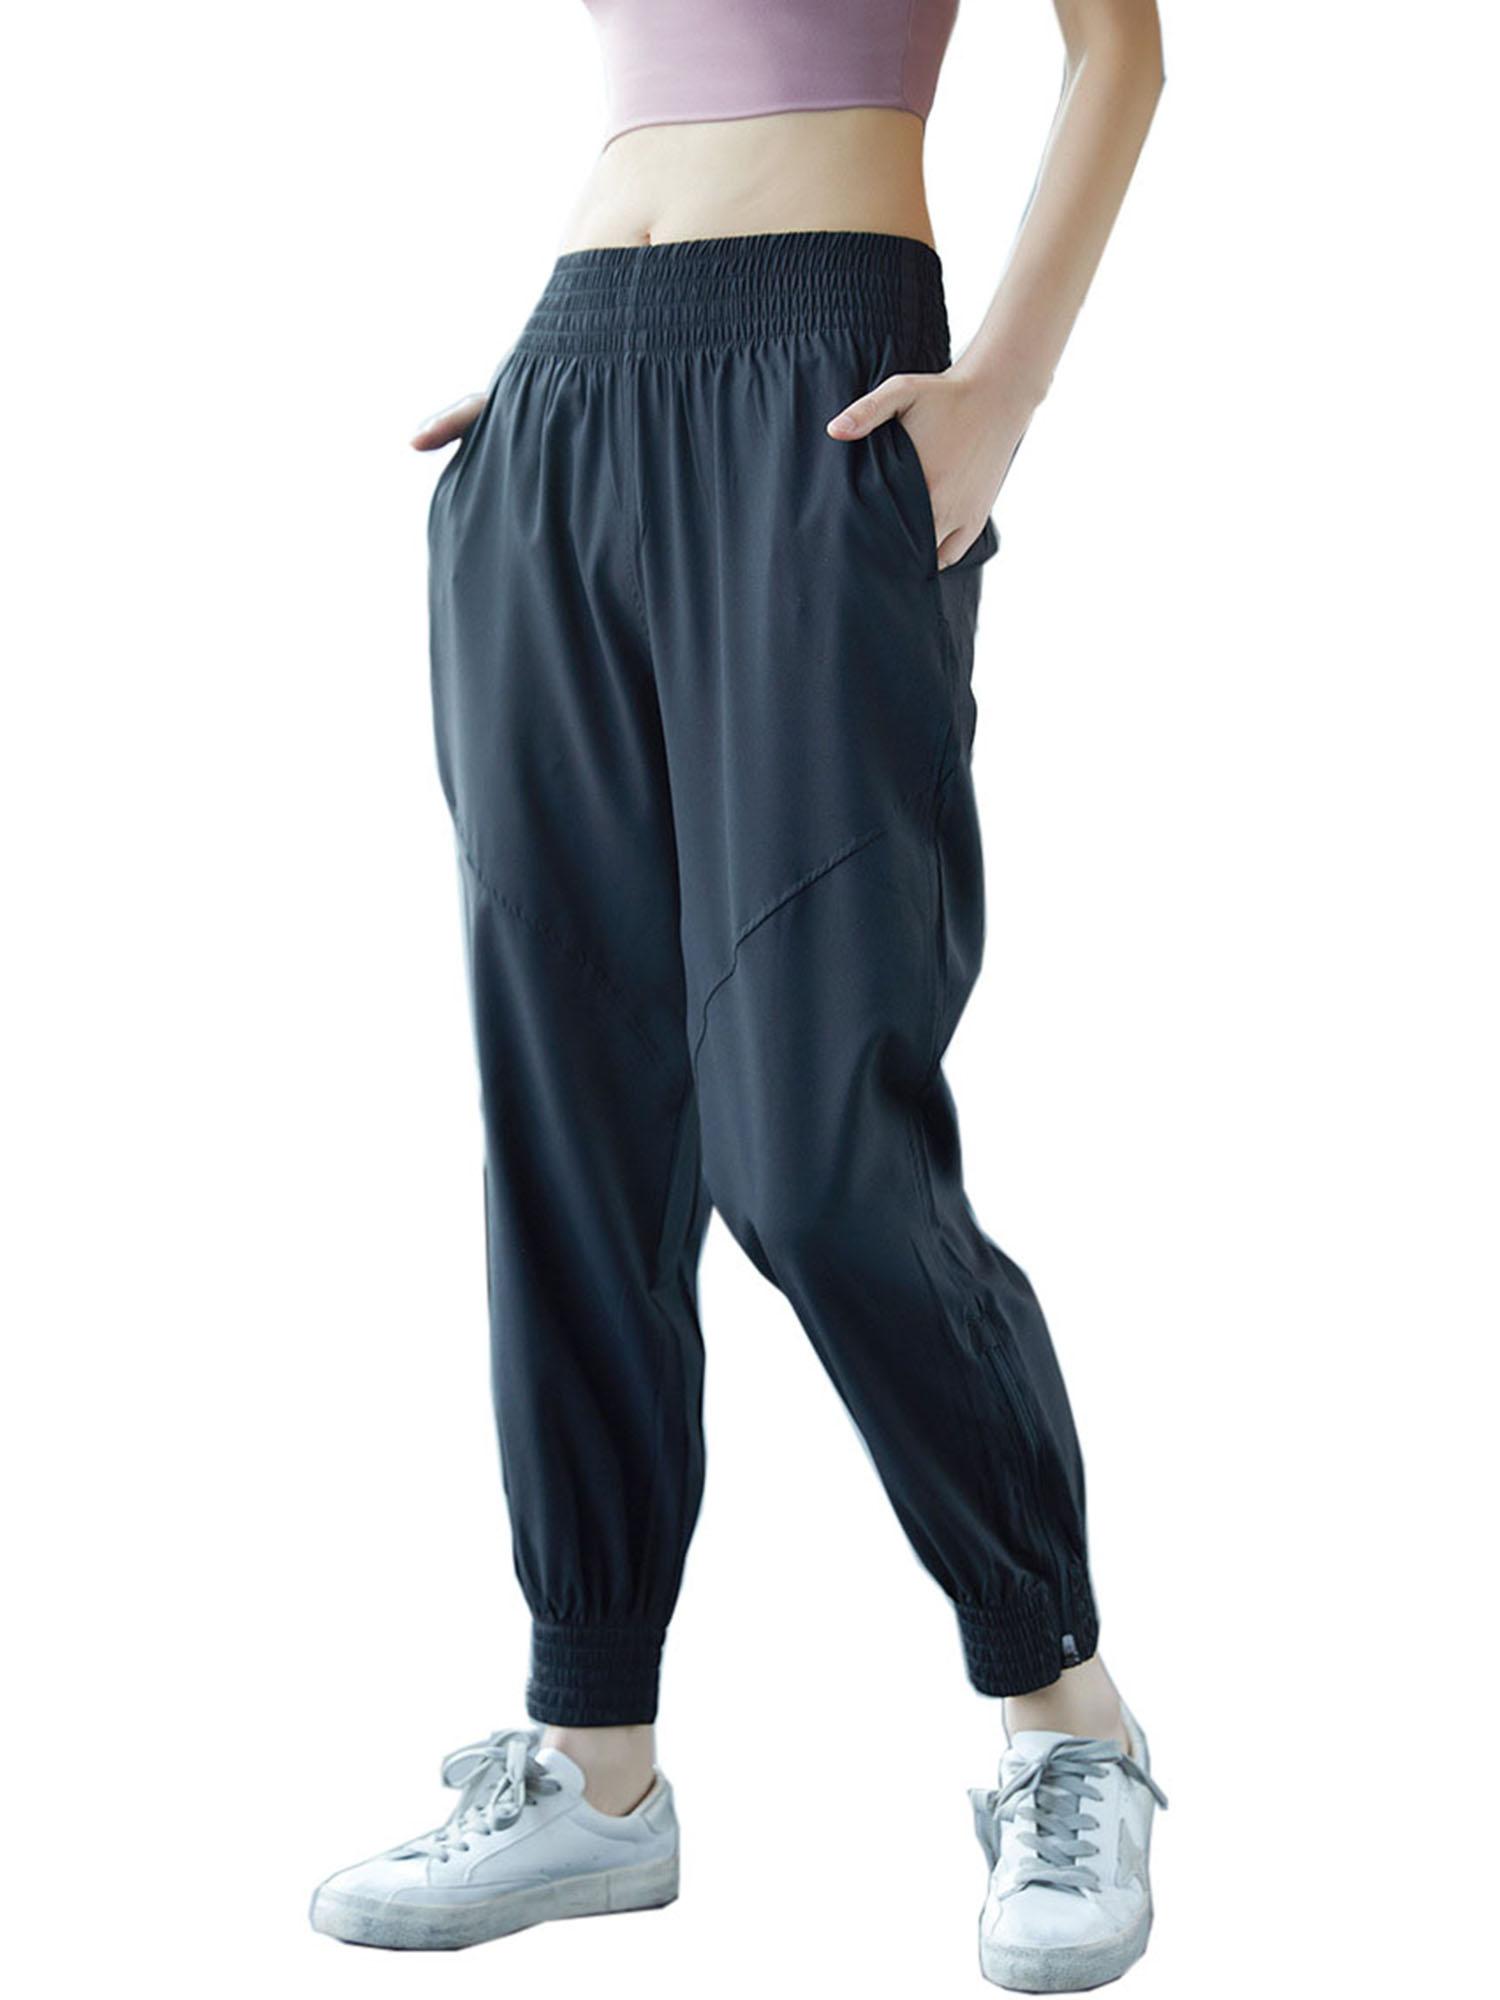 Women Baggy Harem Pants Ladies Loose Casual Sport Gym Jogger Trousers Tracksuit